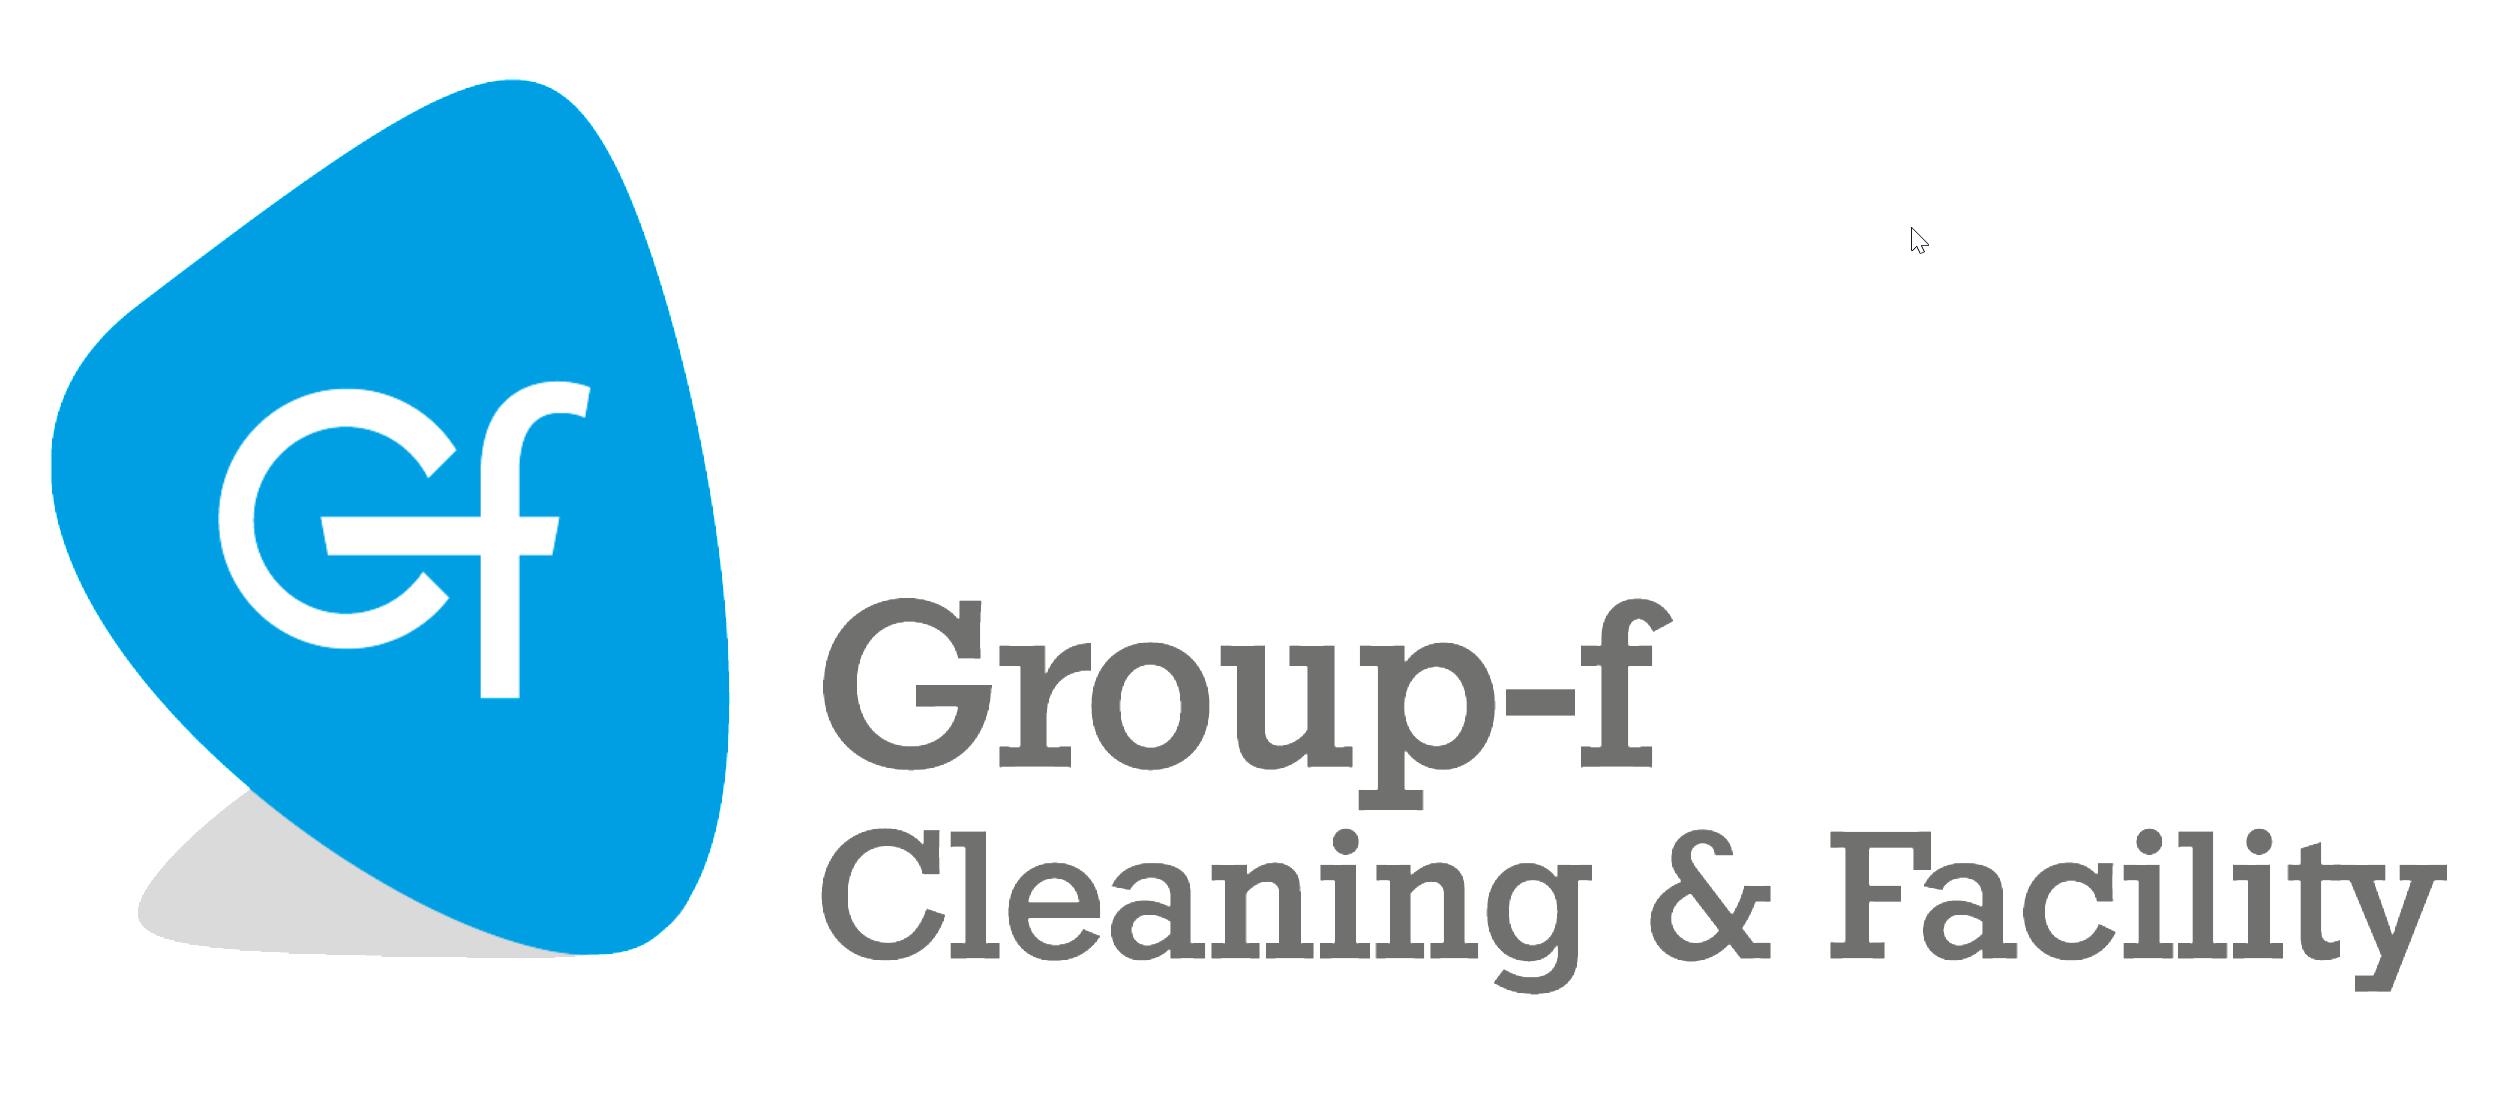 Group-f